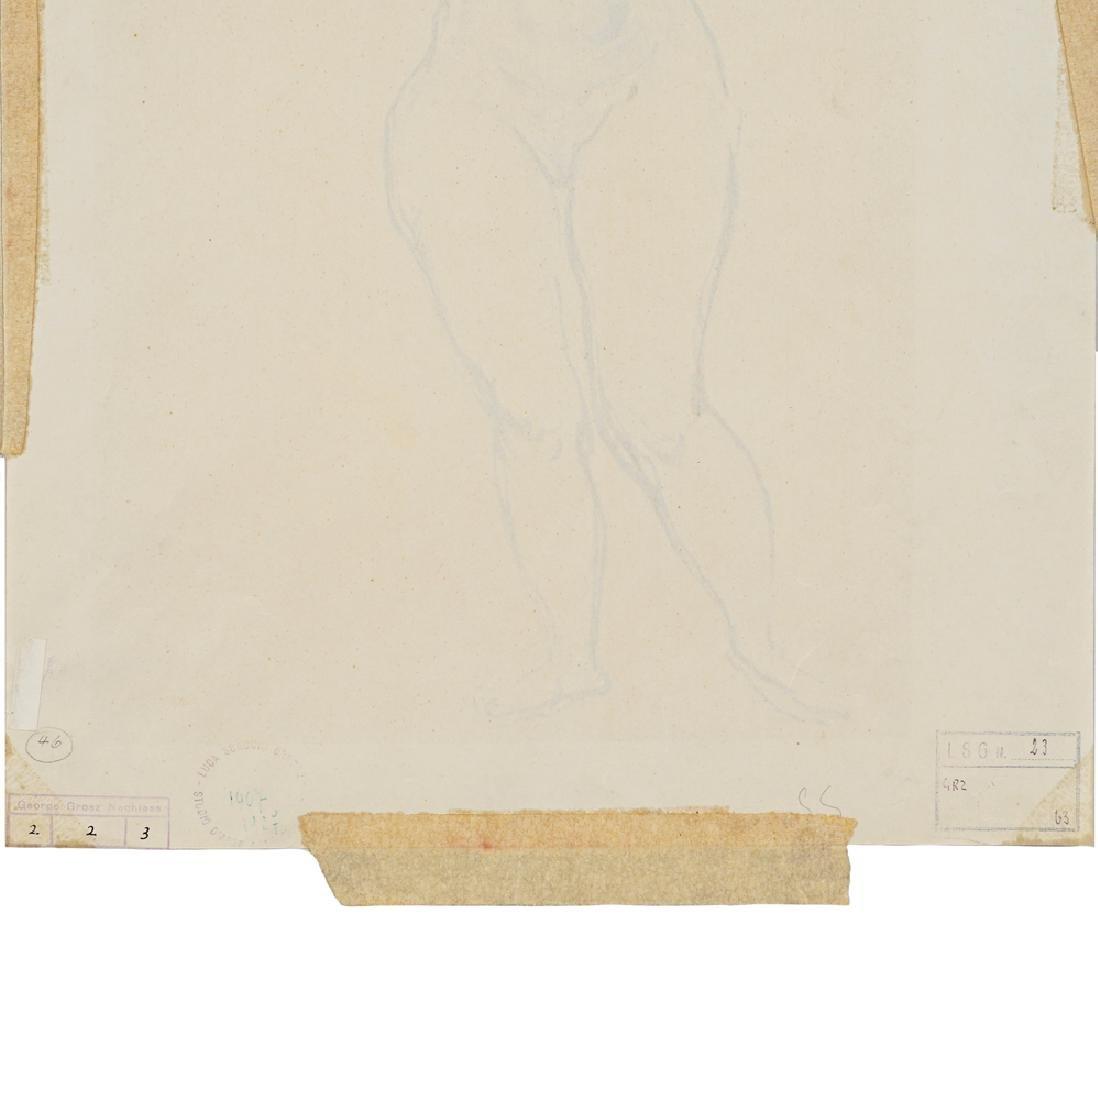 George Grosz Berlino 1893 - 1959 27.9x19.9 cm. - 5